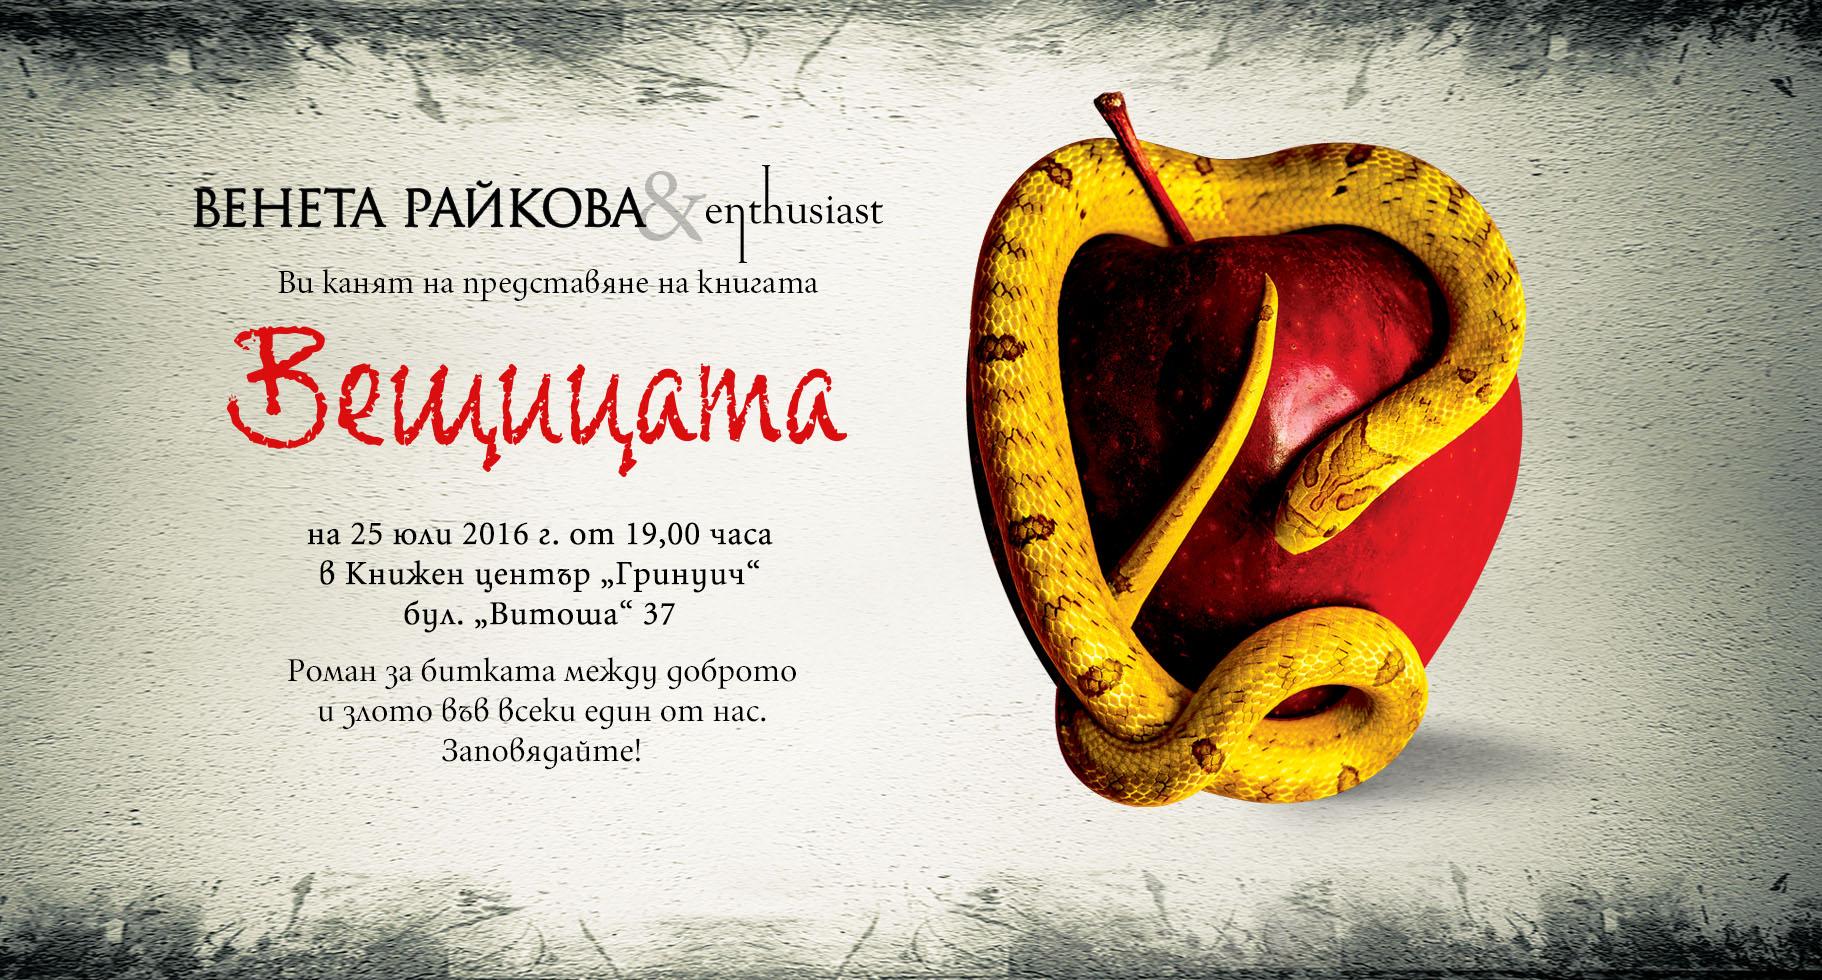 Enthusiast_Veshticata_Pokana_Premiera